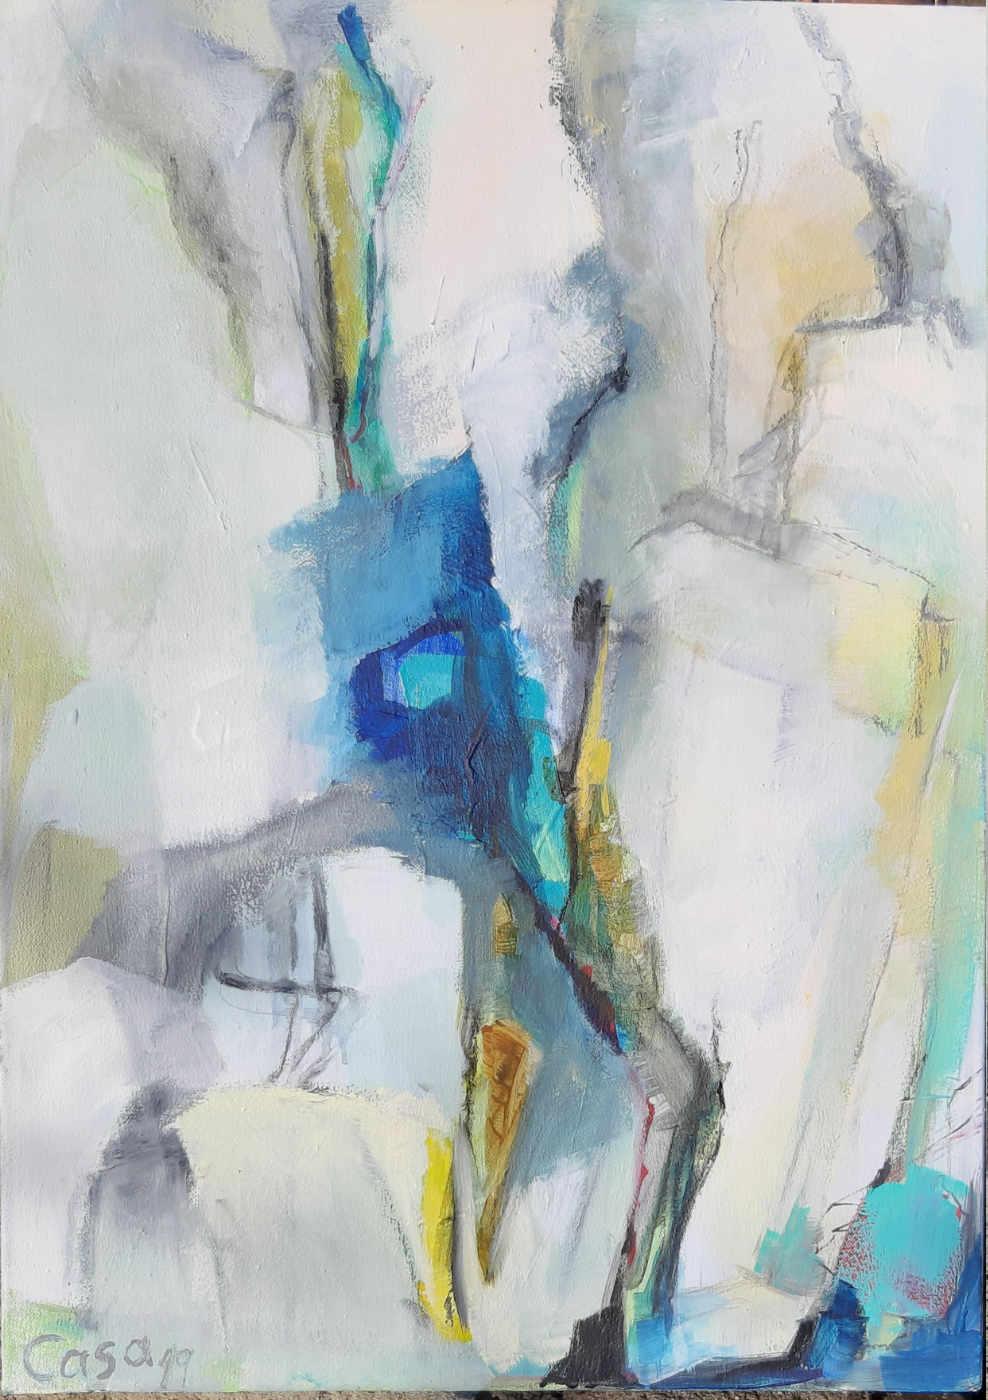 ohne Titel - Acryl auf Leinwand, 70 x 50 cm